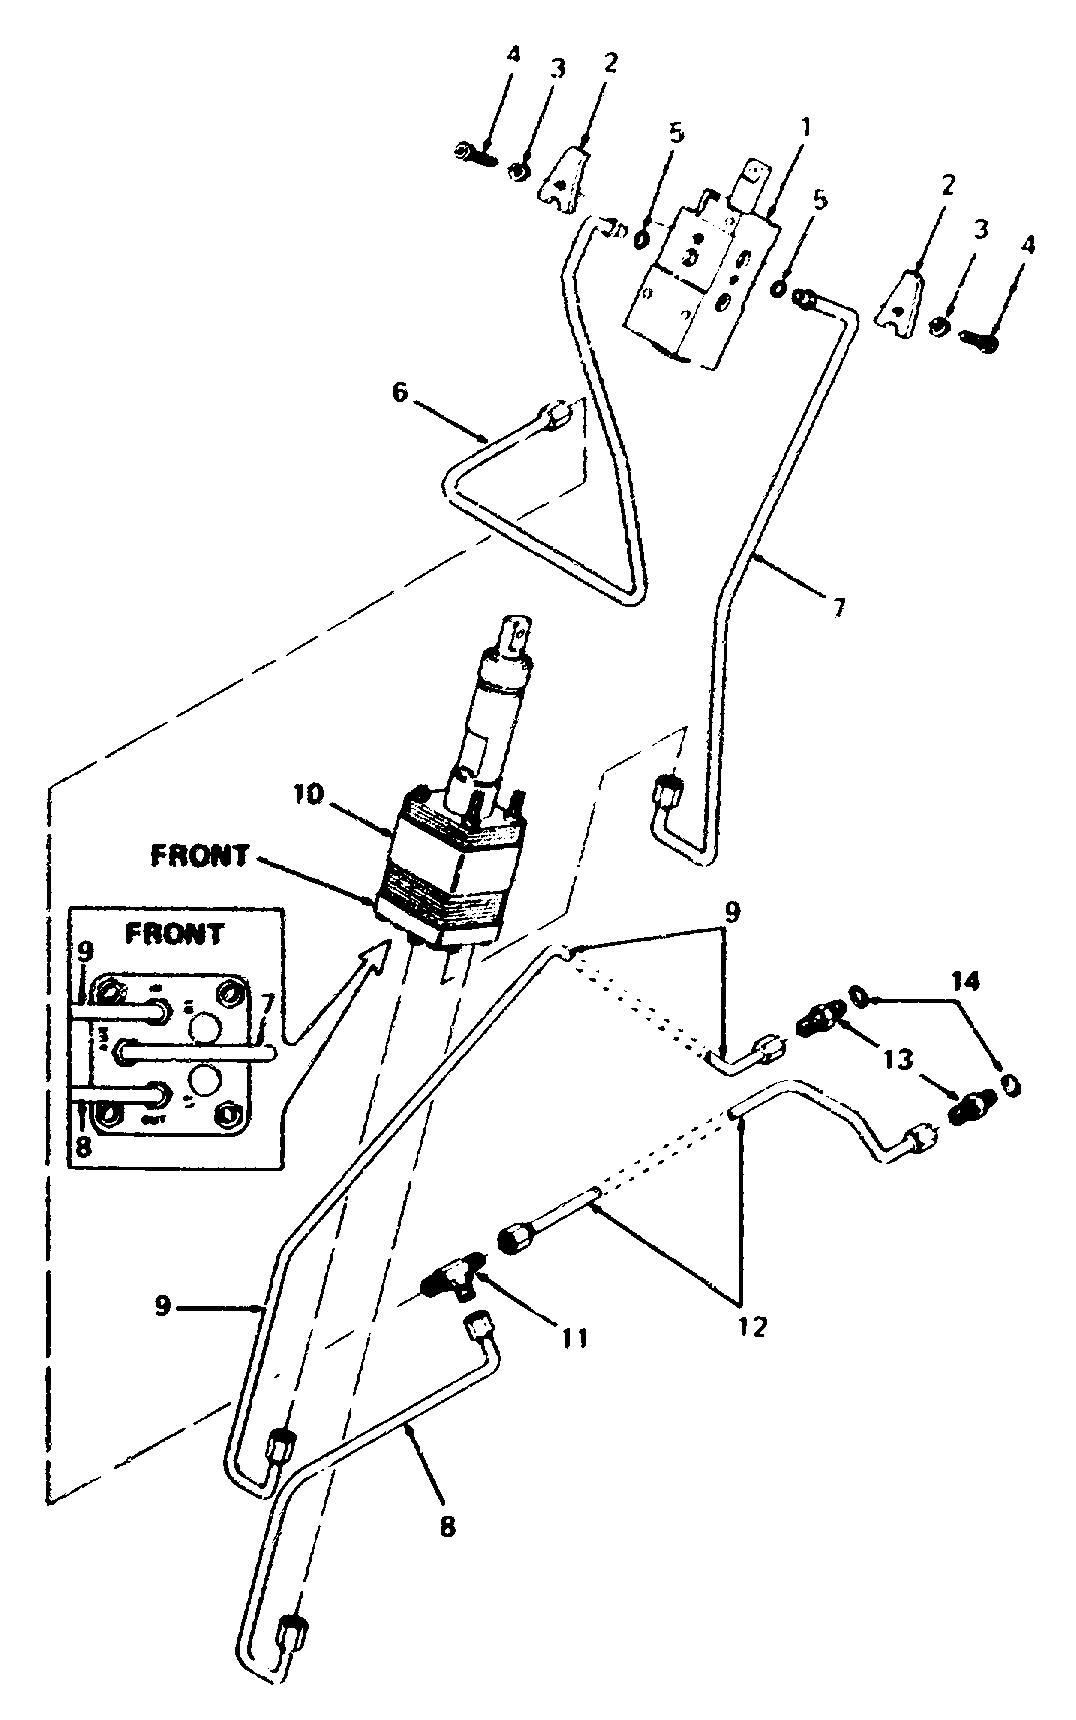 wiring diagram database  tags: #cub cadet zero turn mowers#bush hog zero  turn parts#ariens zero turn mower#walk behind bush hog mowers#bush hog z  turn